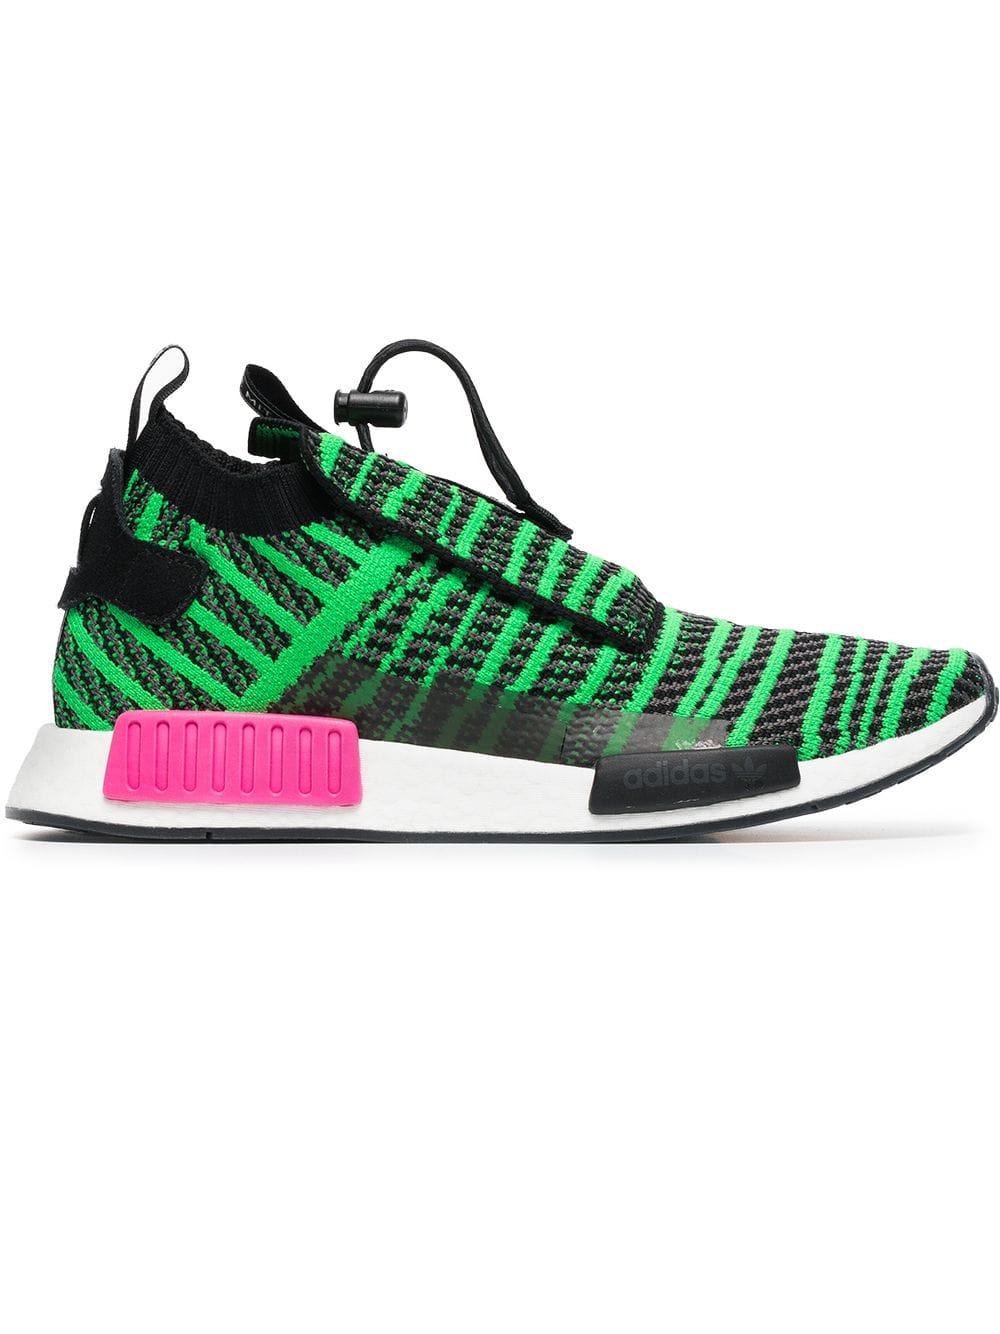 premium selection eaeea daf31 Adidas NMD TS1 Primeknit sneakers - Green - Glami.sk